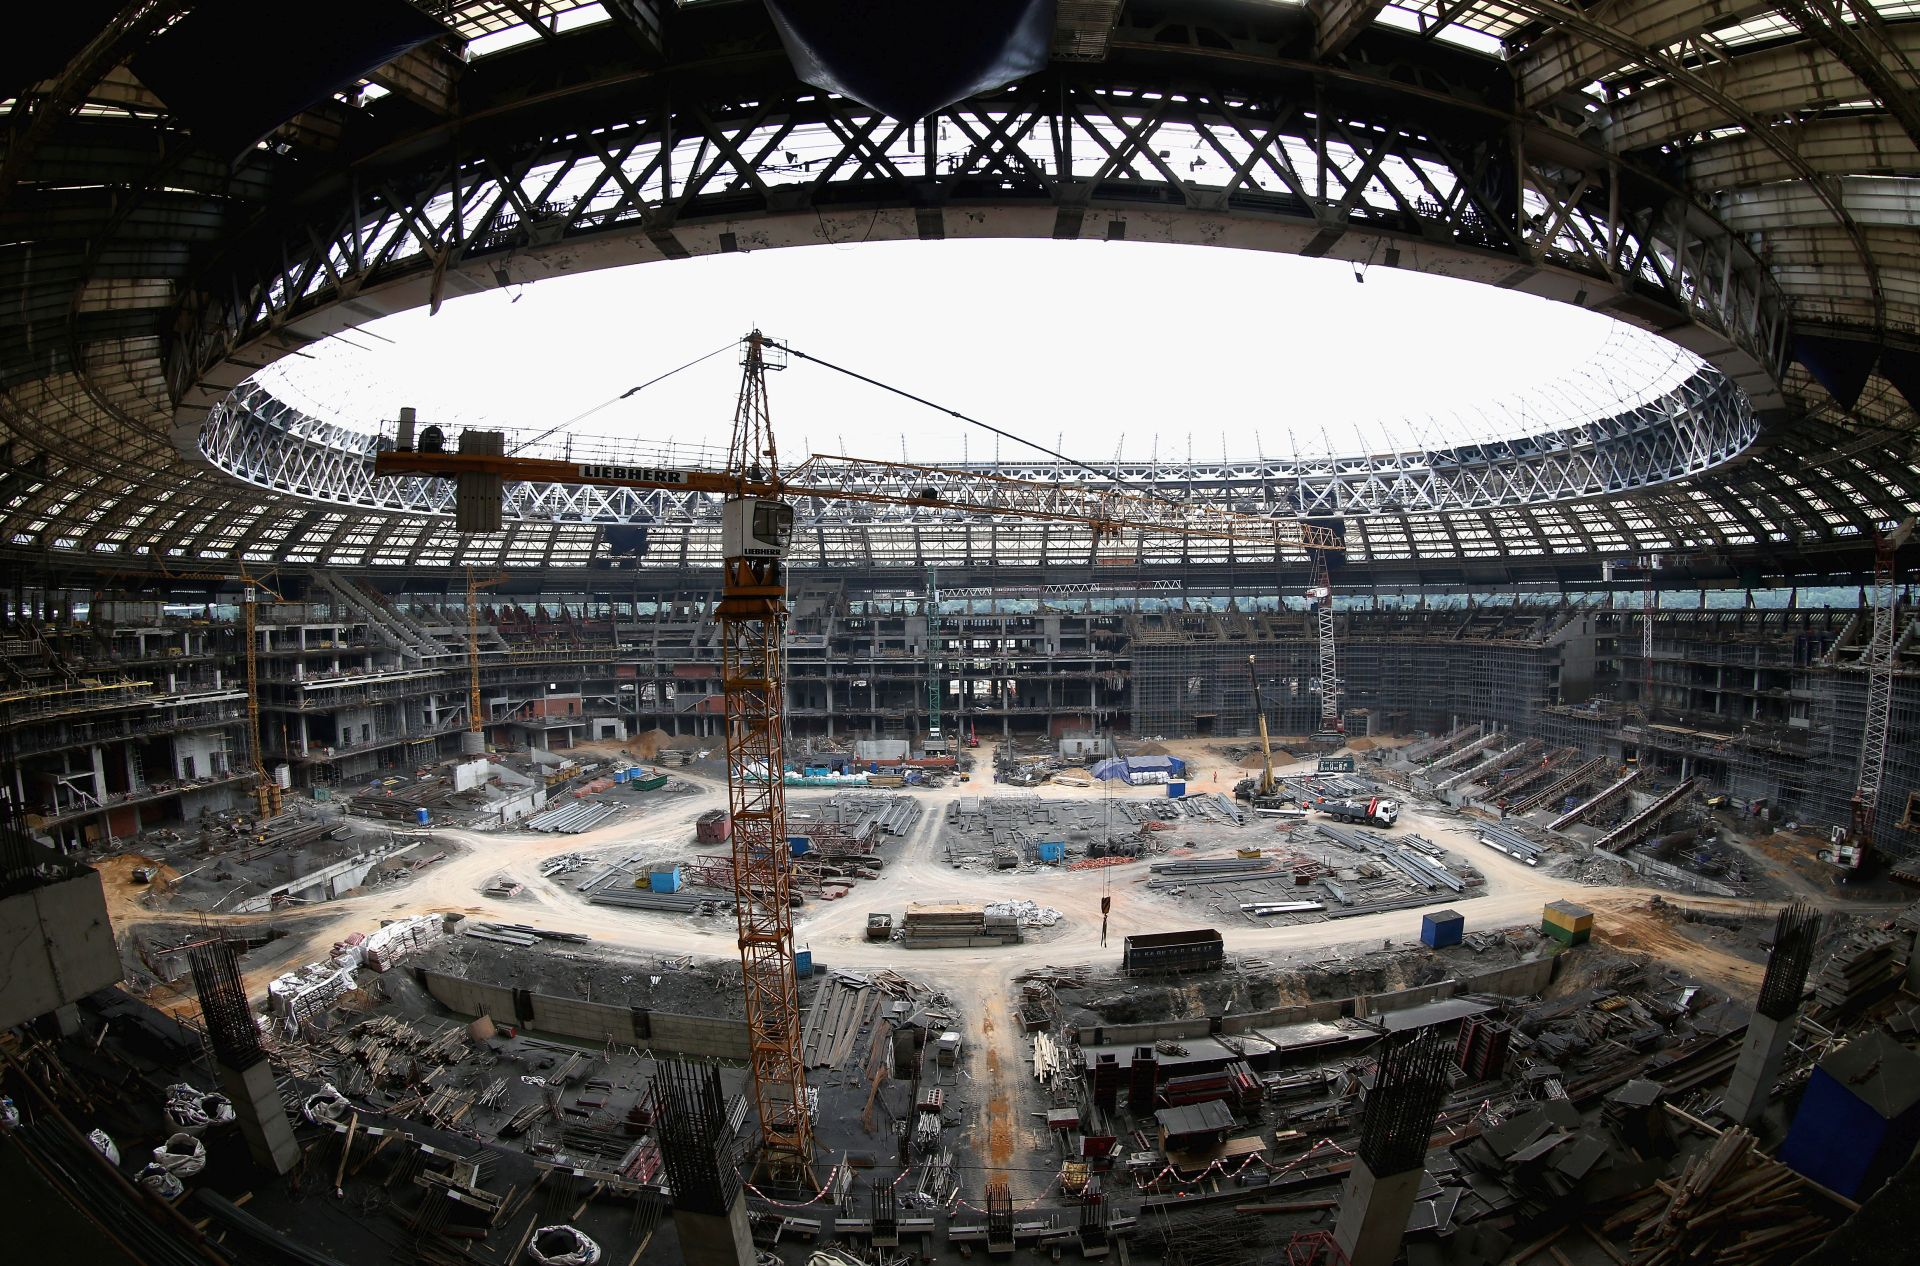 Prva utakmica i finale nogometnog SP 2018. igrat će se u Moskvi